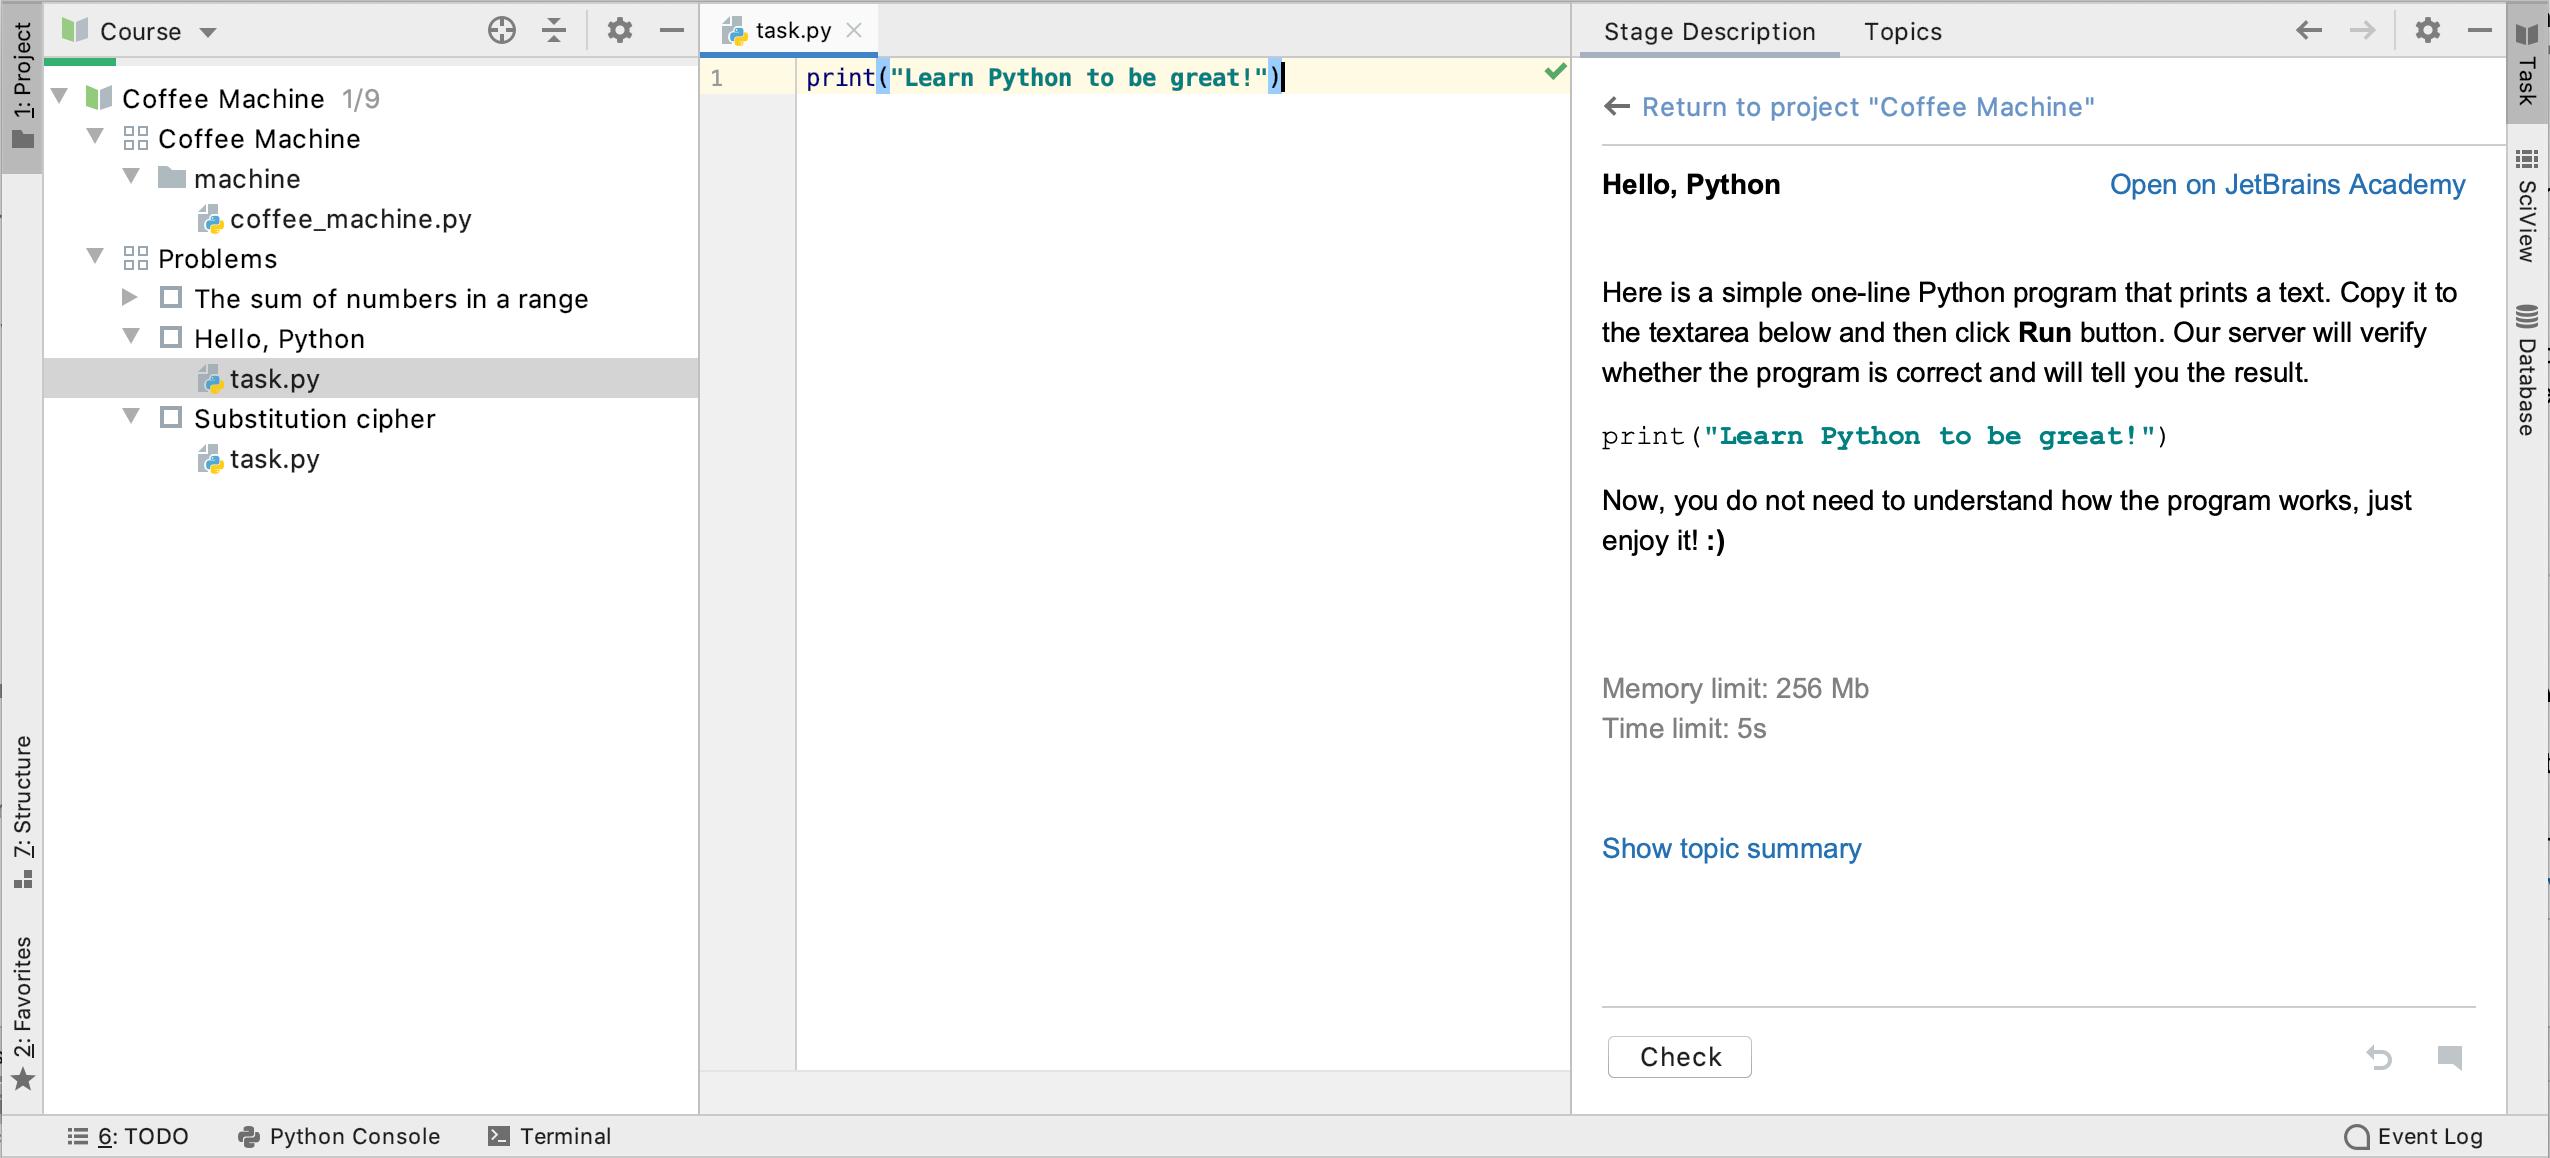 Edu jba code challenge ide python